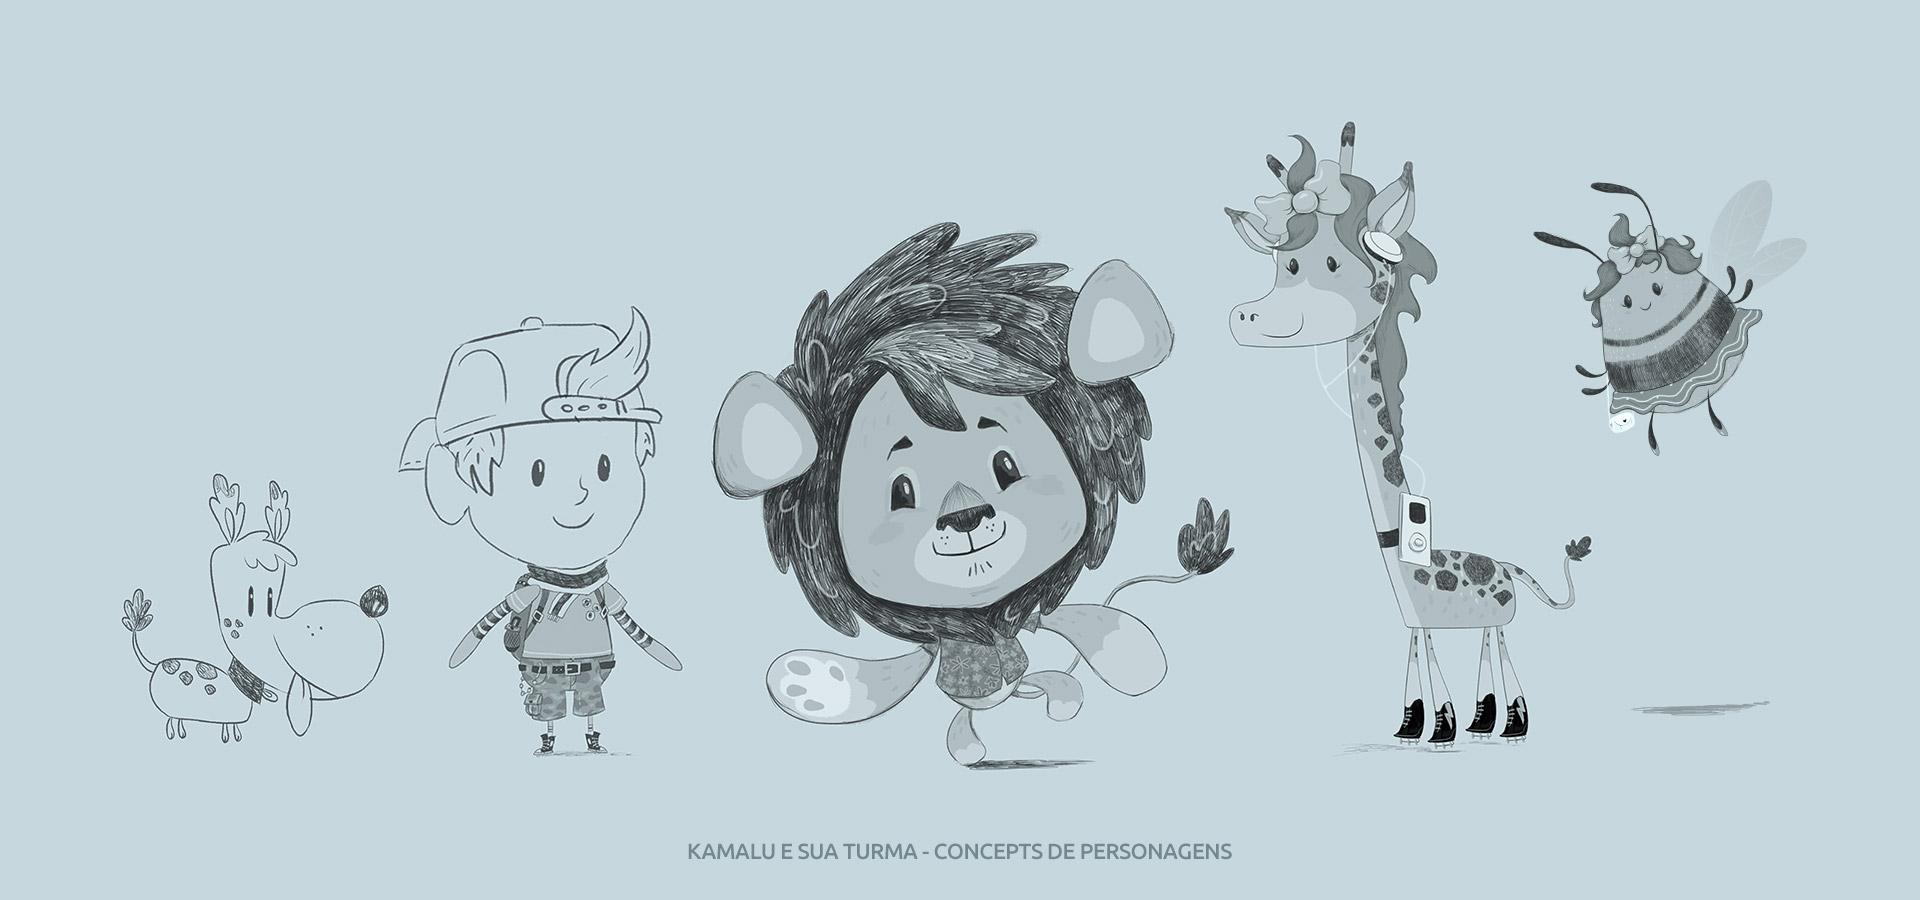 kamalu e sua turma concepts de personagens dumela filmes - Kamalu e Sua Turma